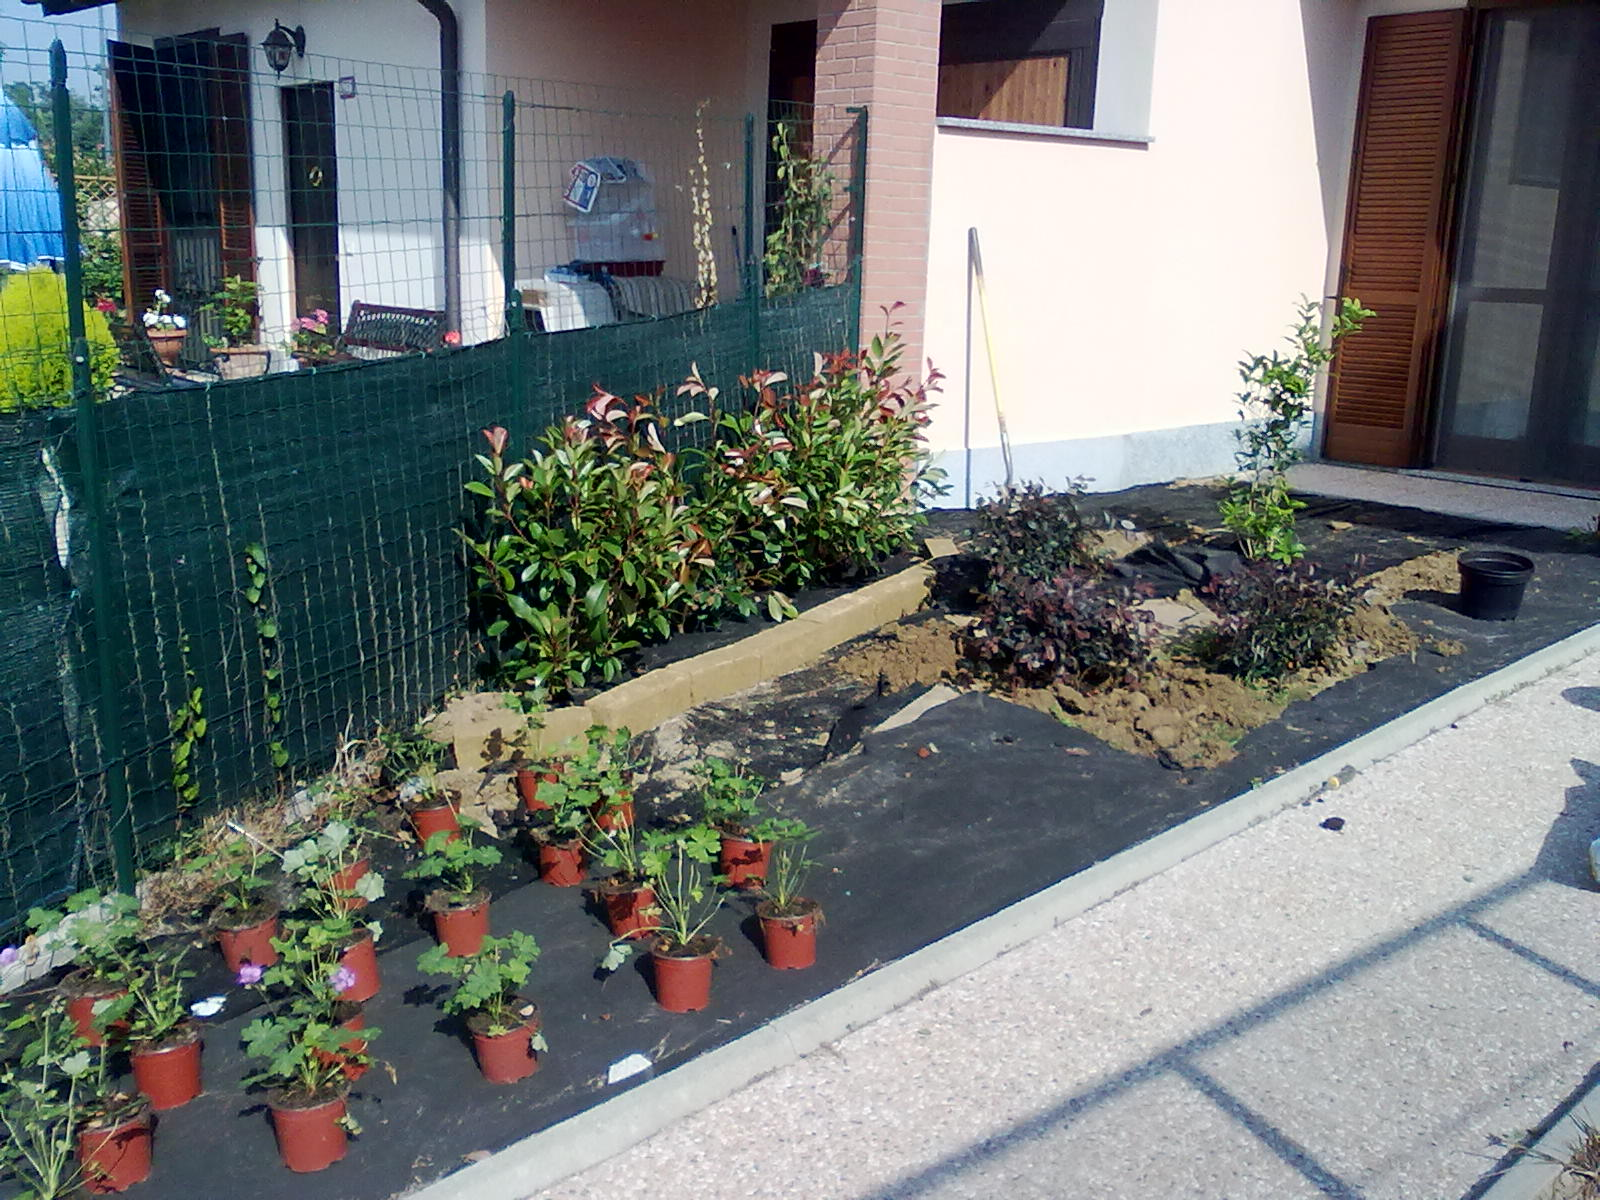 Bersani giardini aiuole for Aiuole giardino con sassi